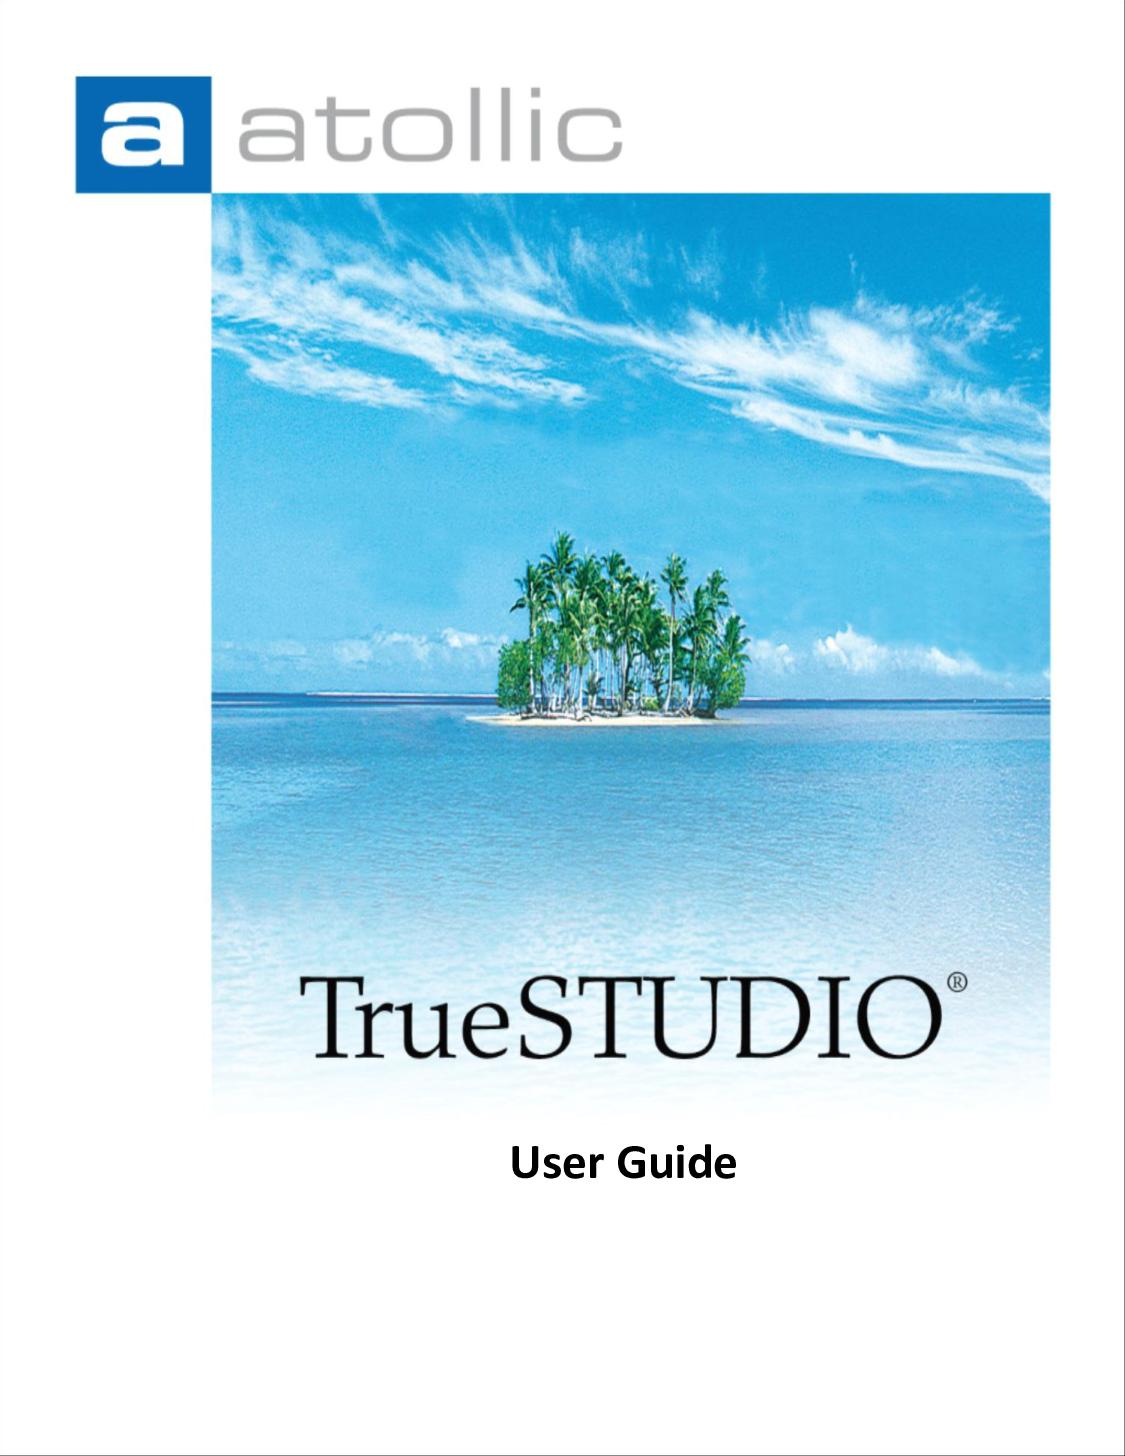 User Guide Atollic True STUDIO For STM32